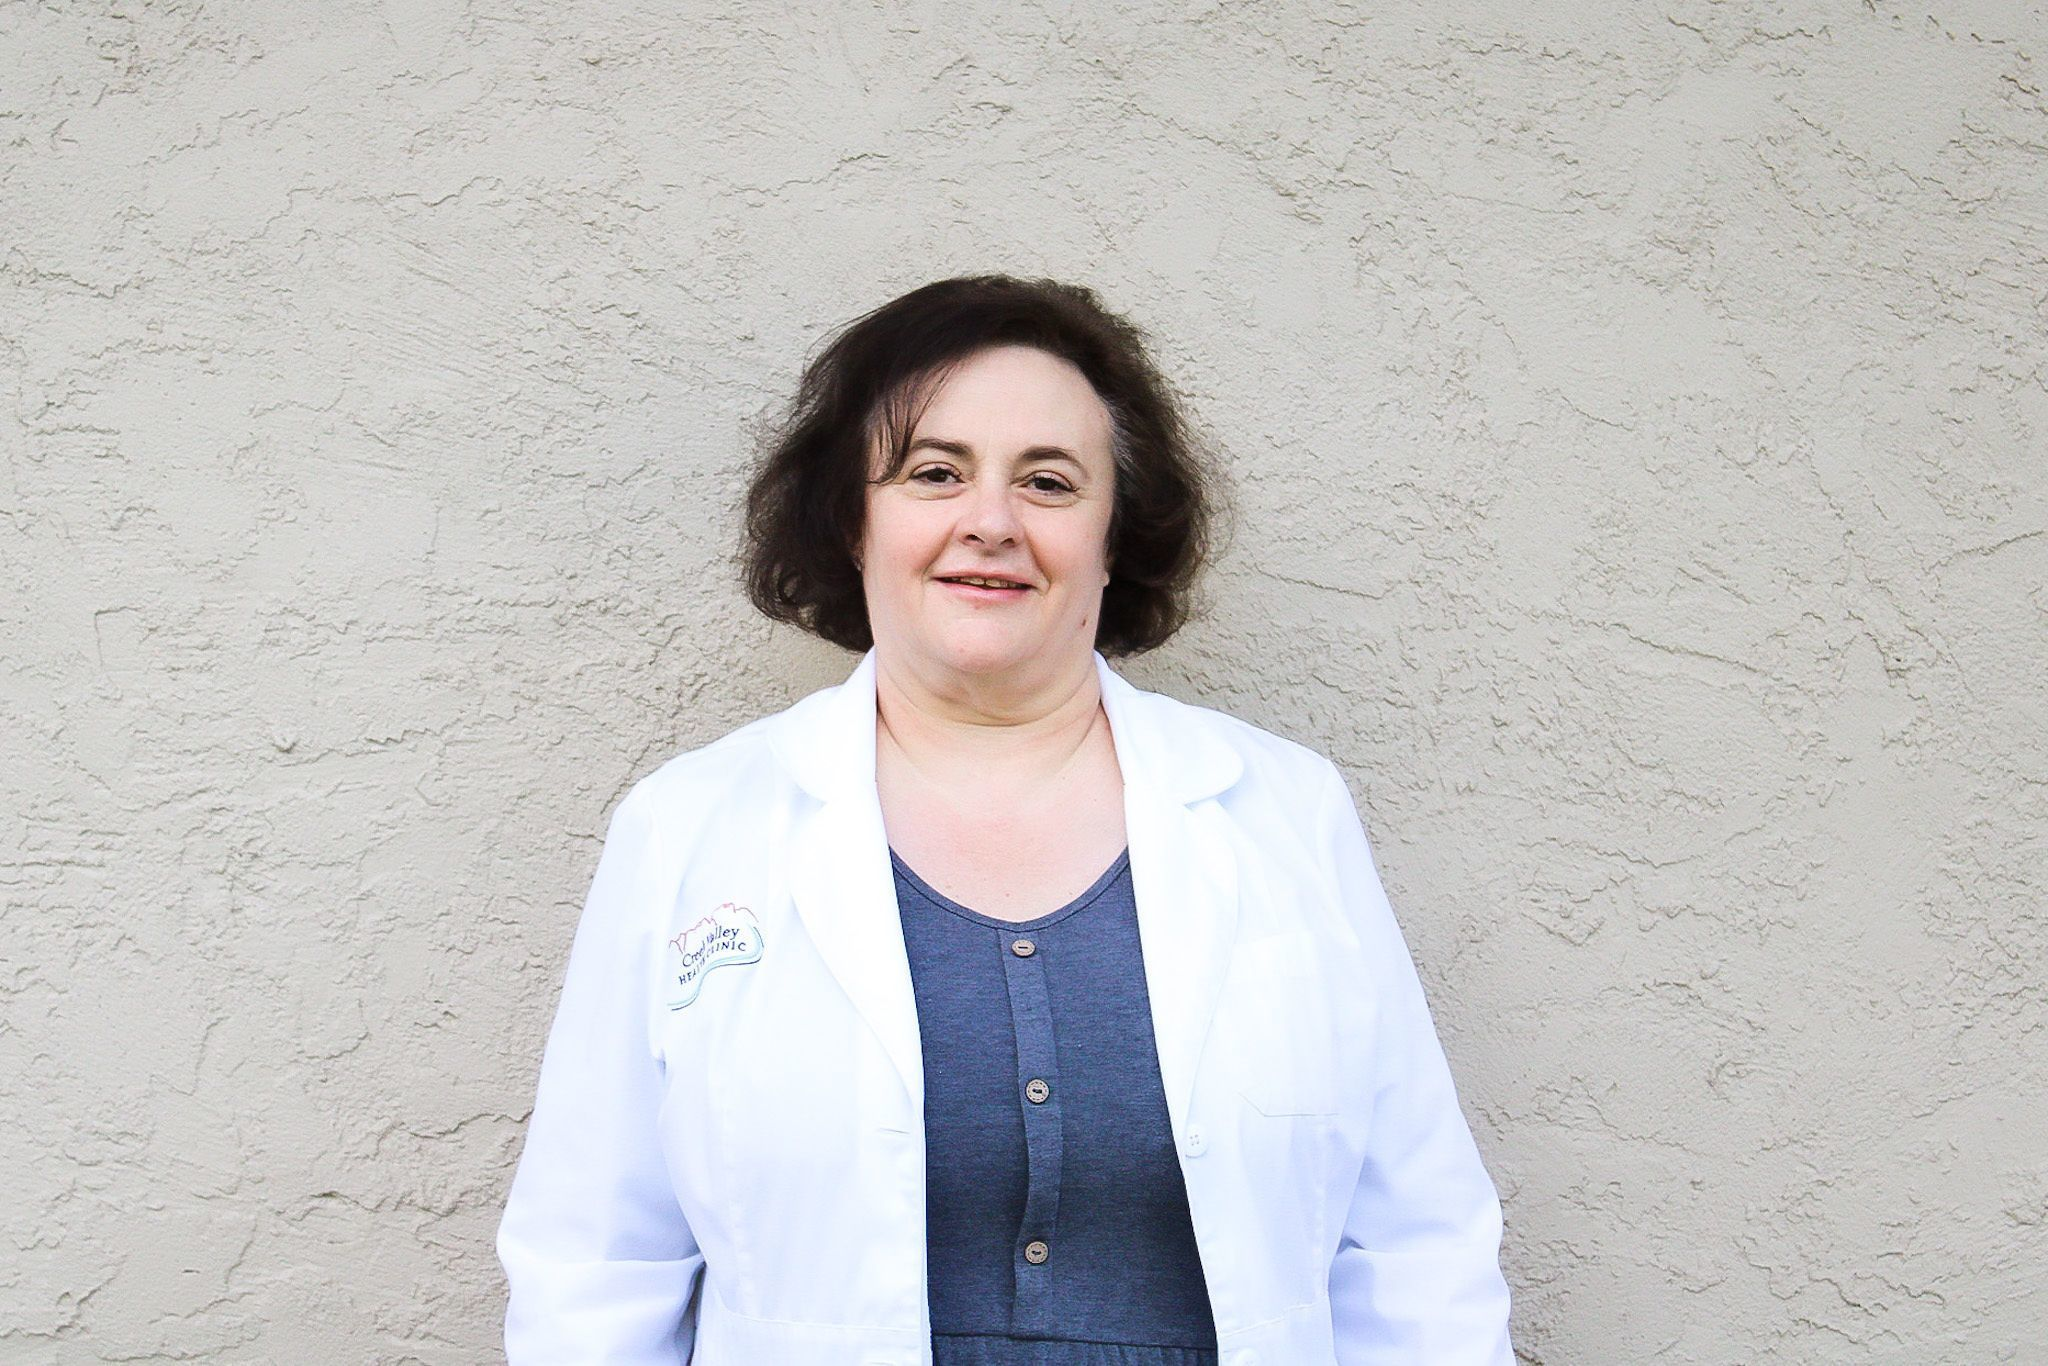 Joanne Yarrish, CNM, FNP